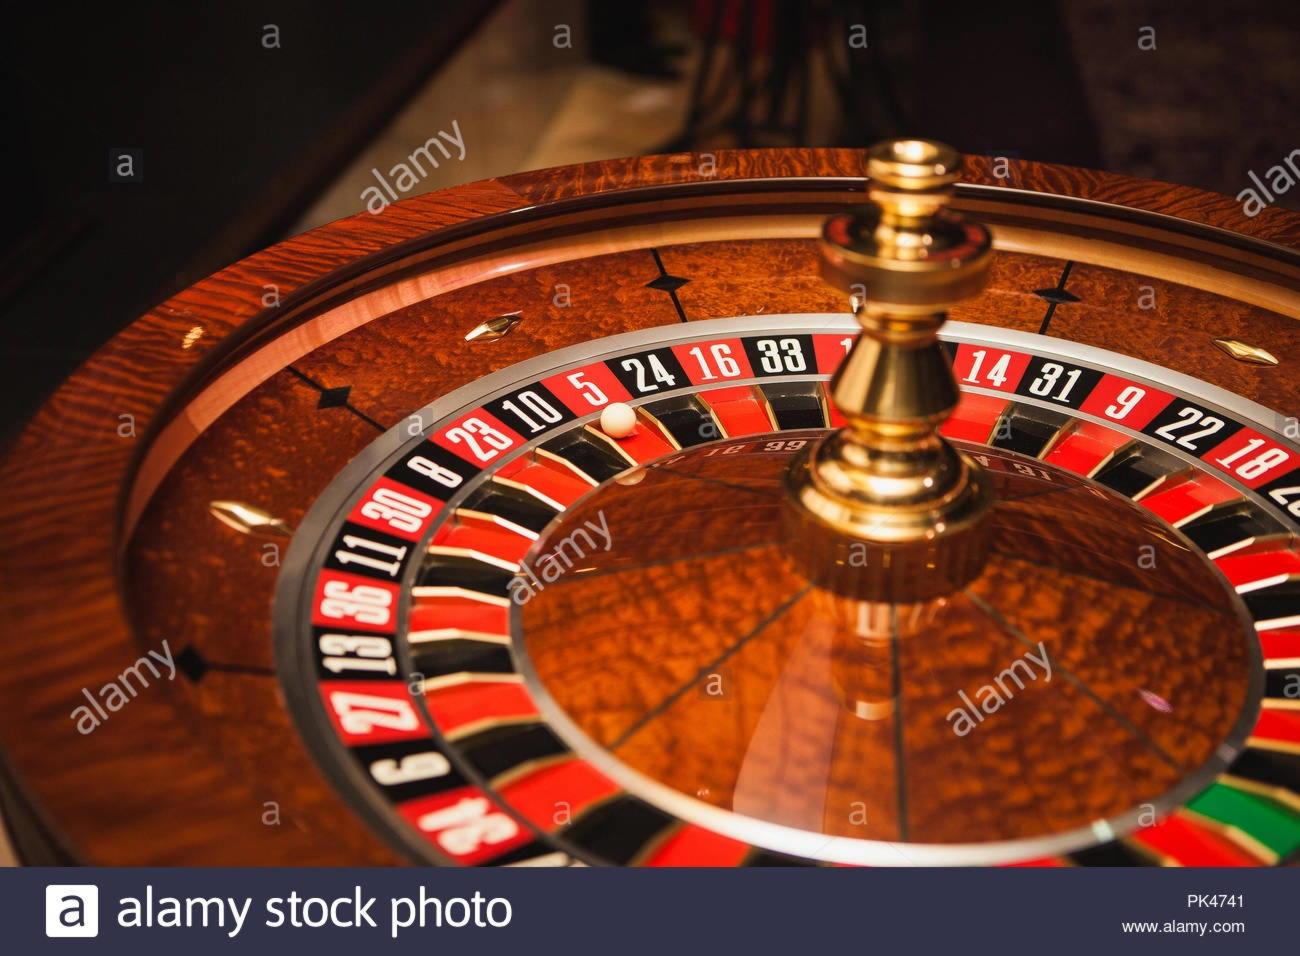 845% Regjistrohu Bonus kazino në Besties Bingo